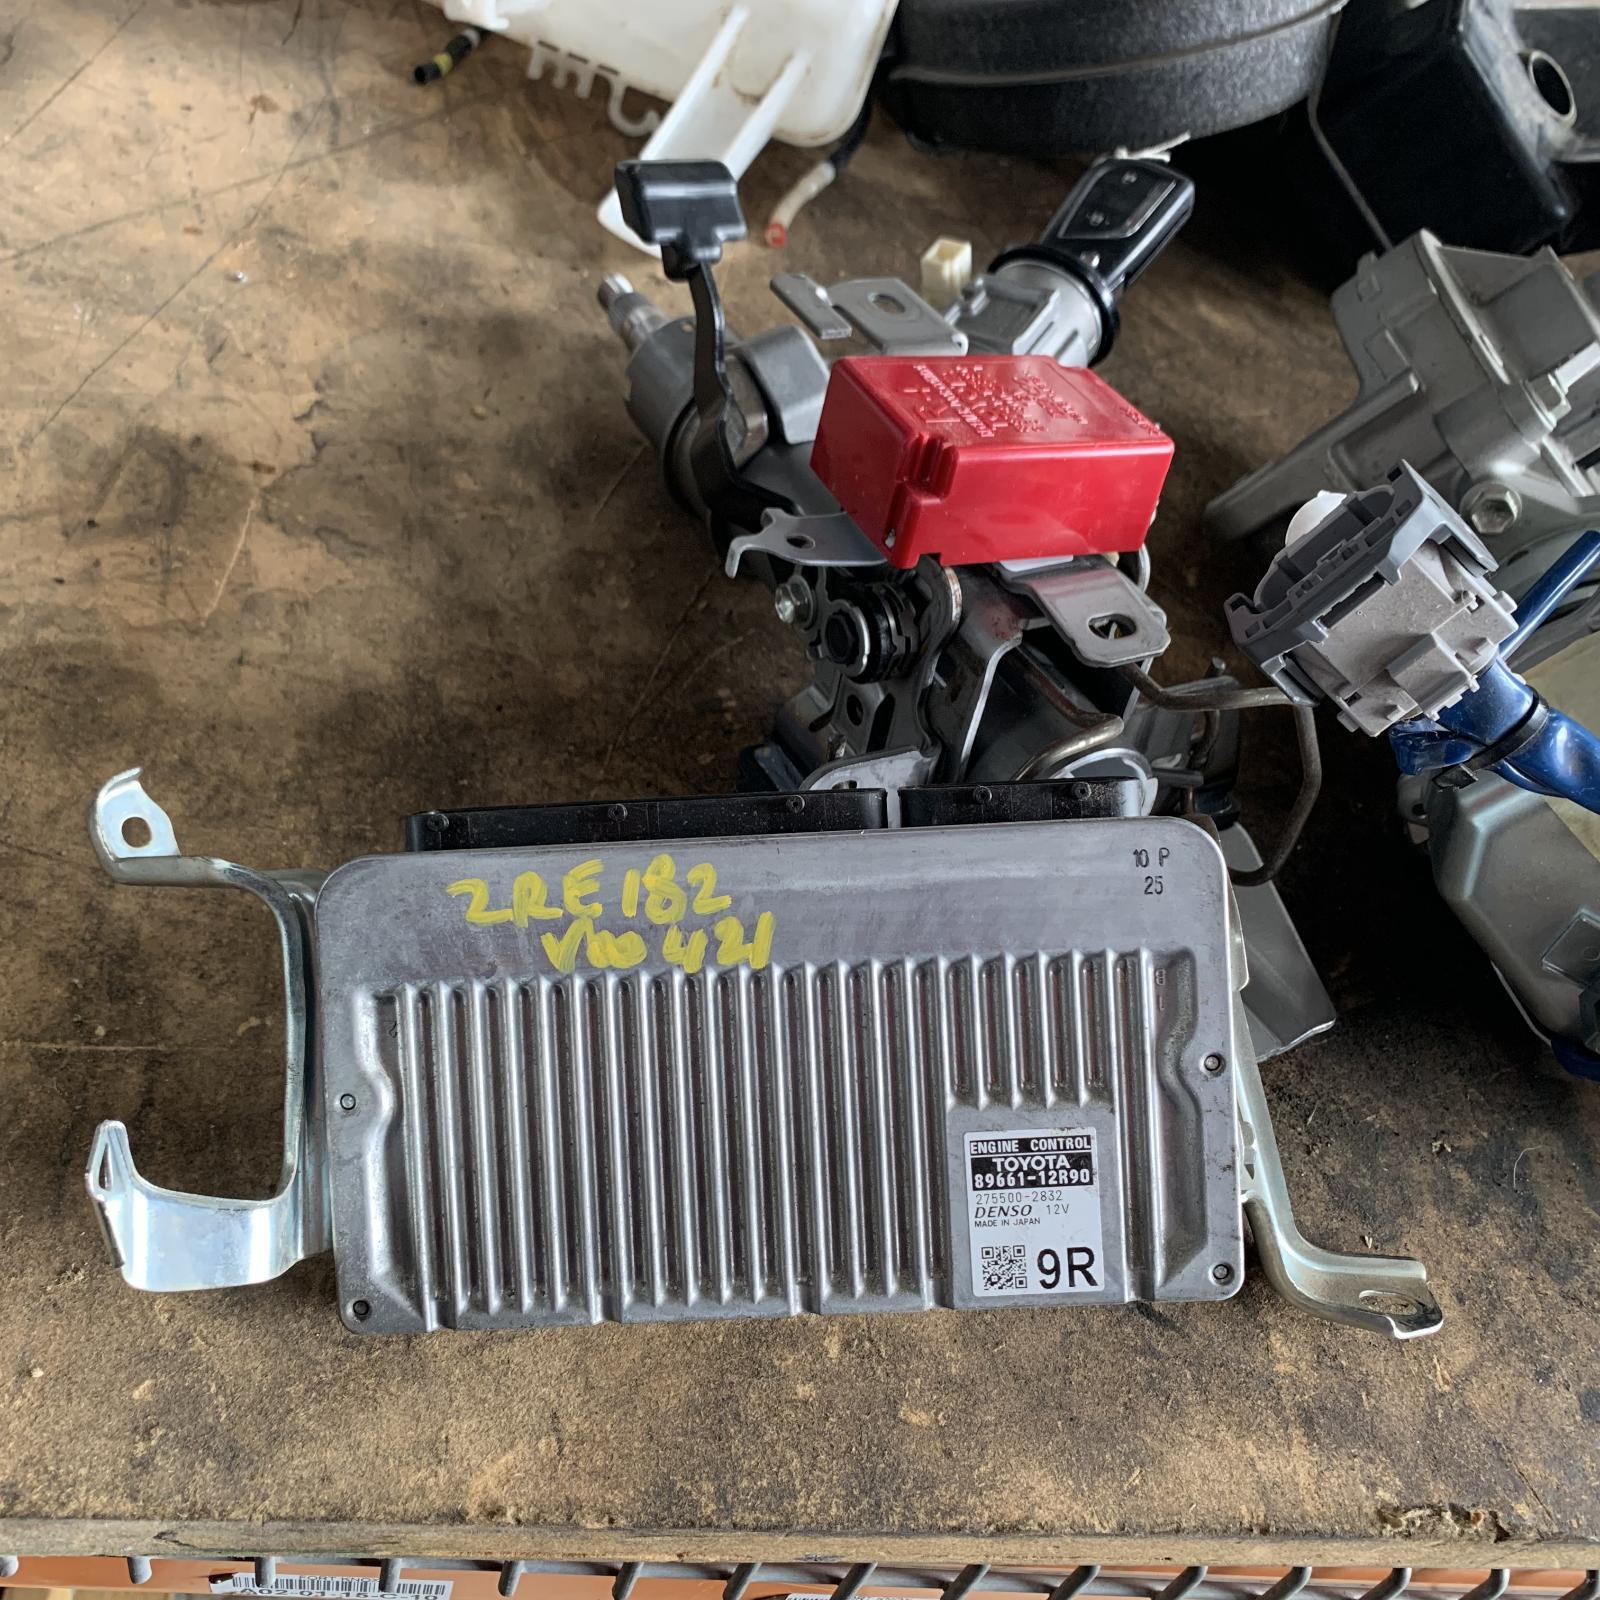 TOYOTA COROLLA, Ecu, ENGINE ECU, AUTO T/M TYPE, ECU ONLY, ZRE182R, 10/12-